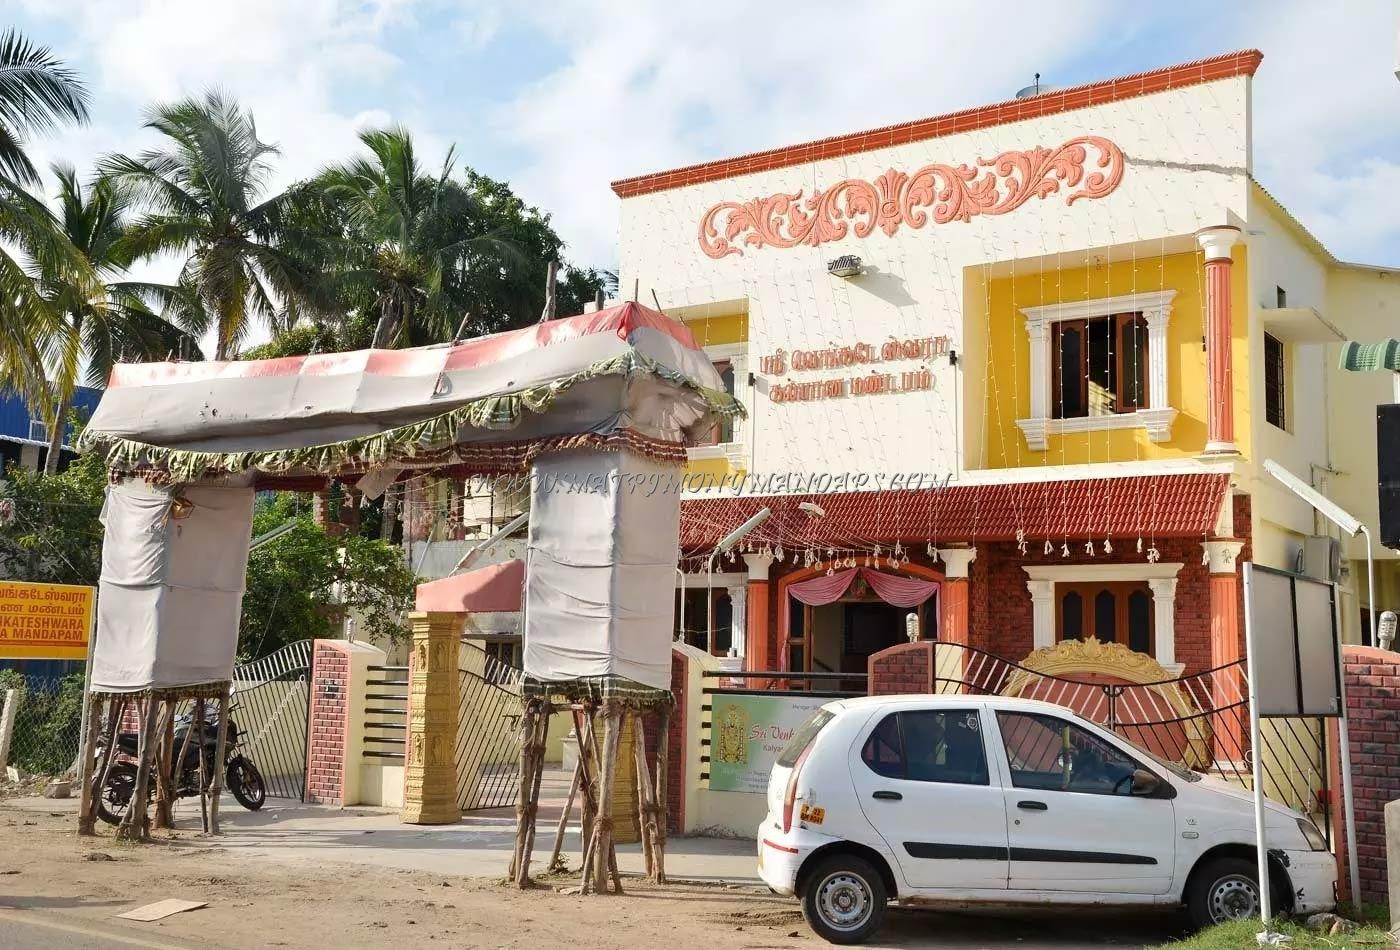 Find the availability of the Venkateshwara Kalyana Mandapam (A/C) in Madambakkam, Chennai and avail special offers